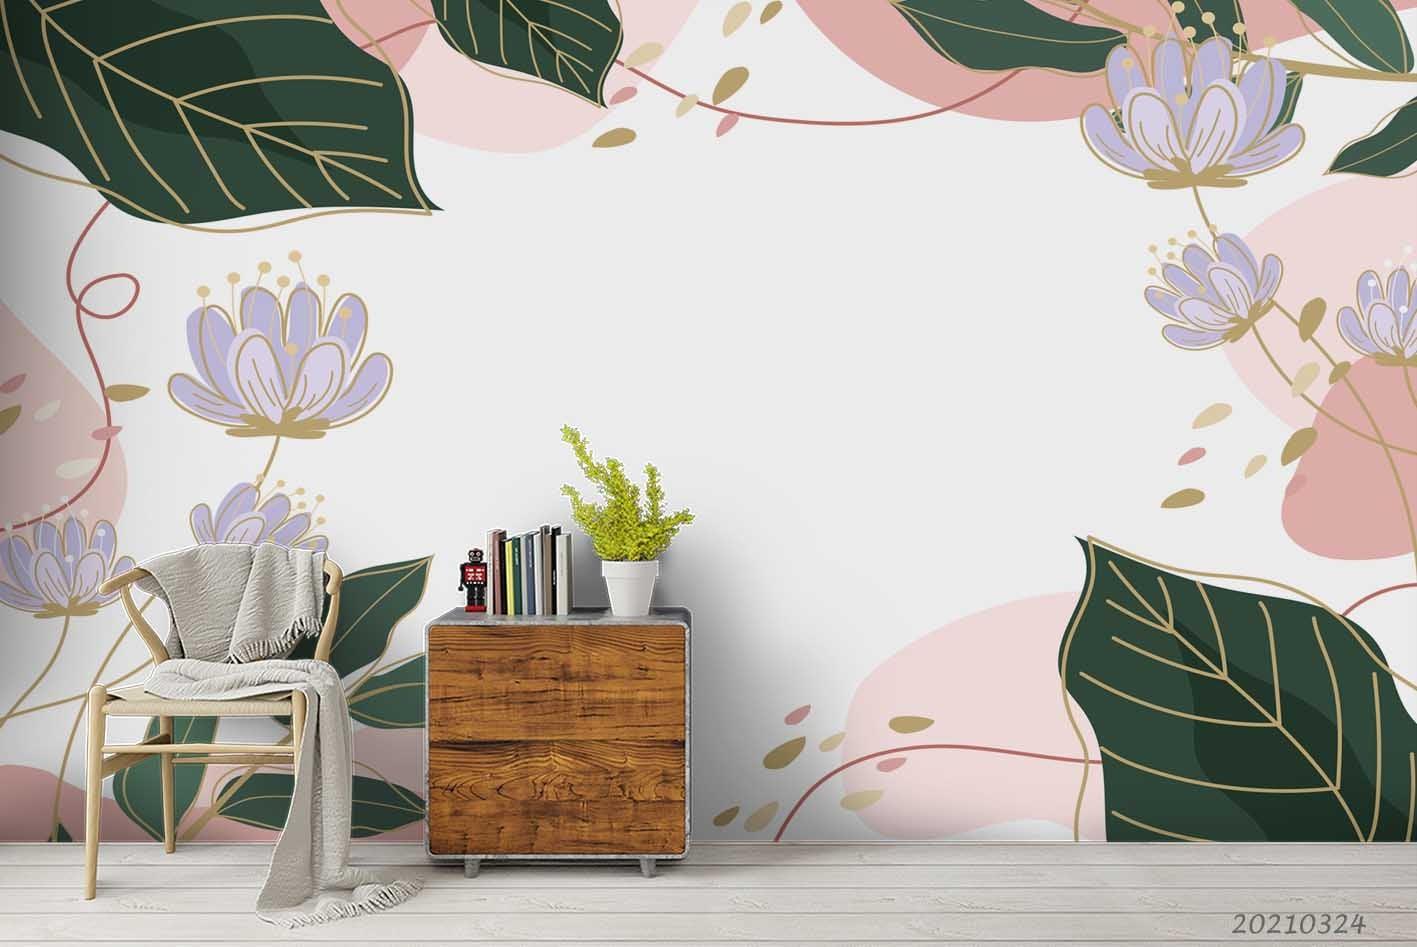 3D Watercolor Floral Leaves Wall Mural Wallpaper LQH 10